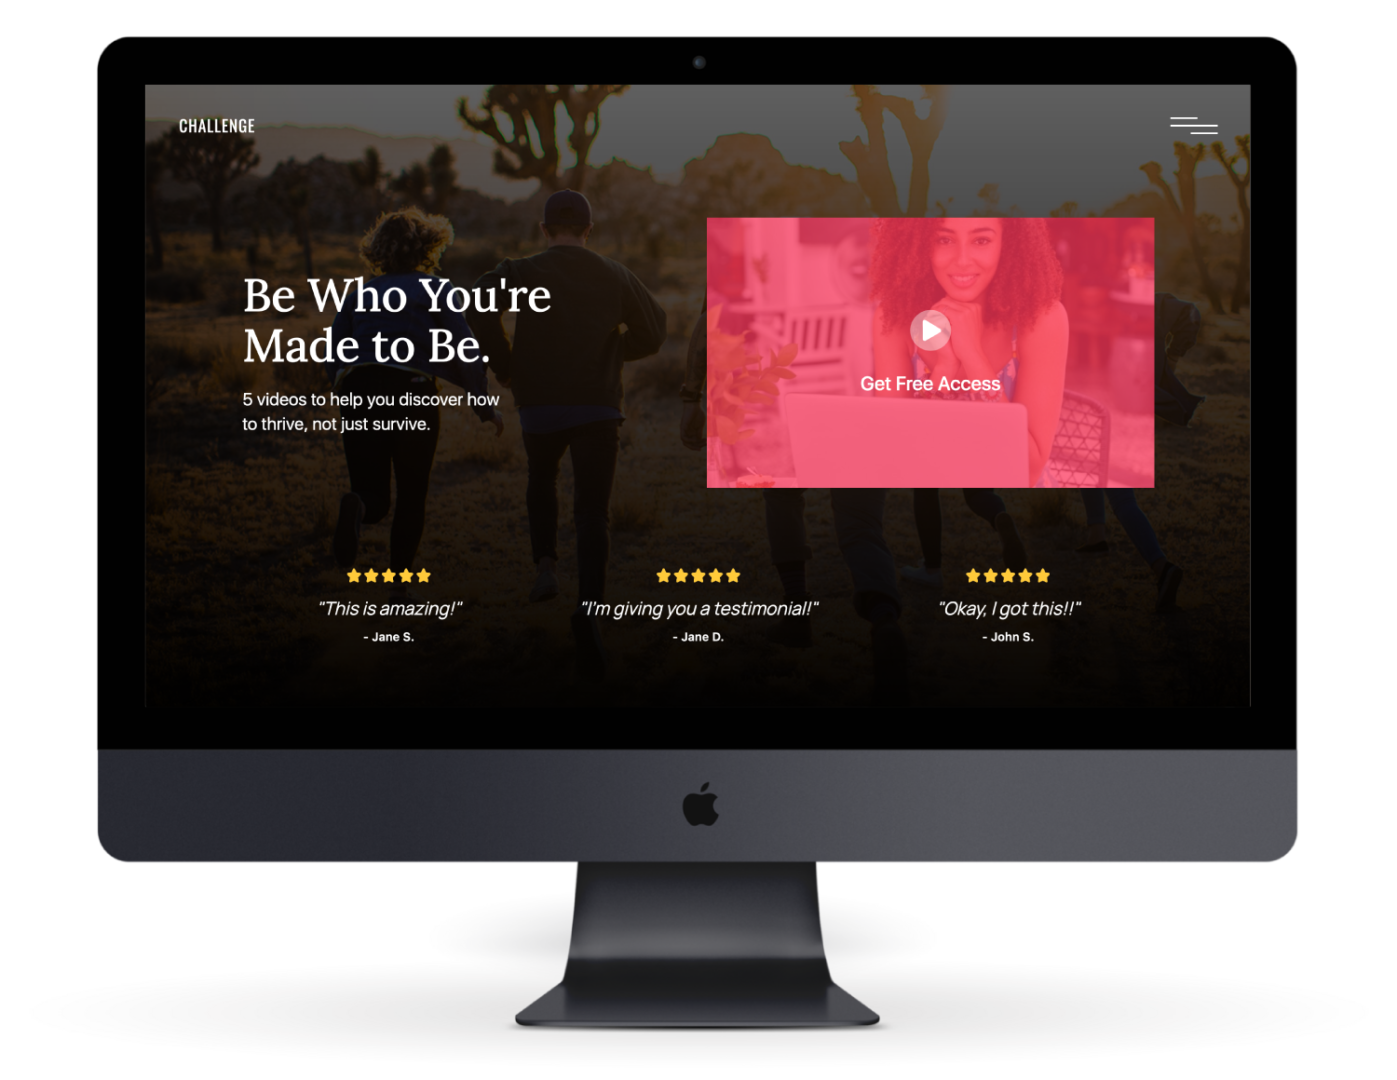 Challenge website on mac pro